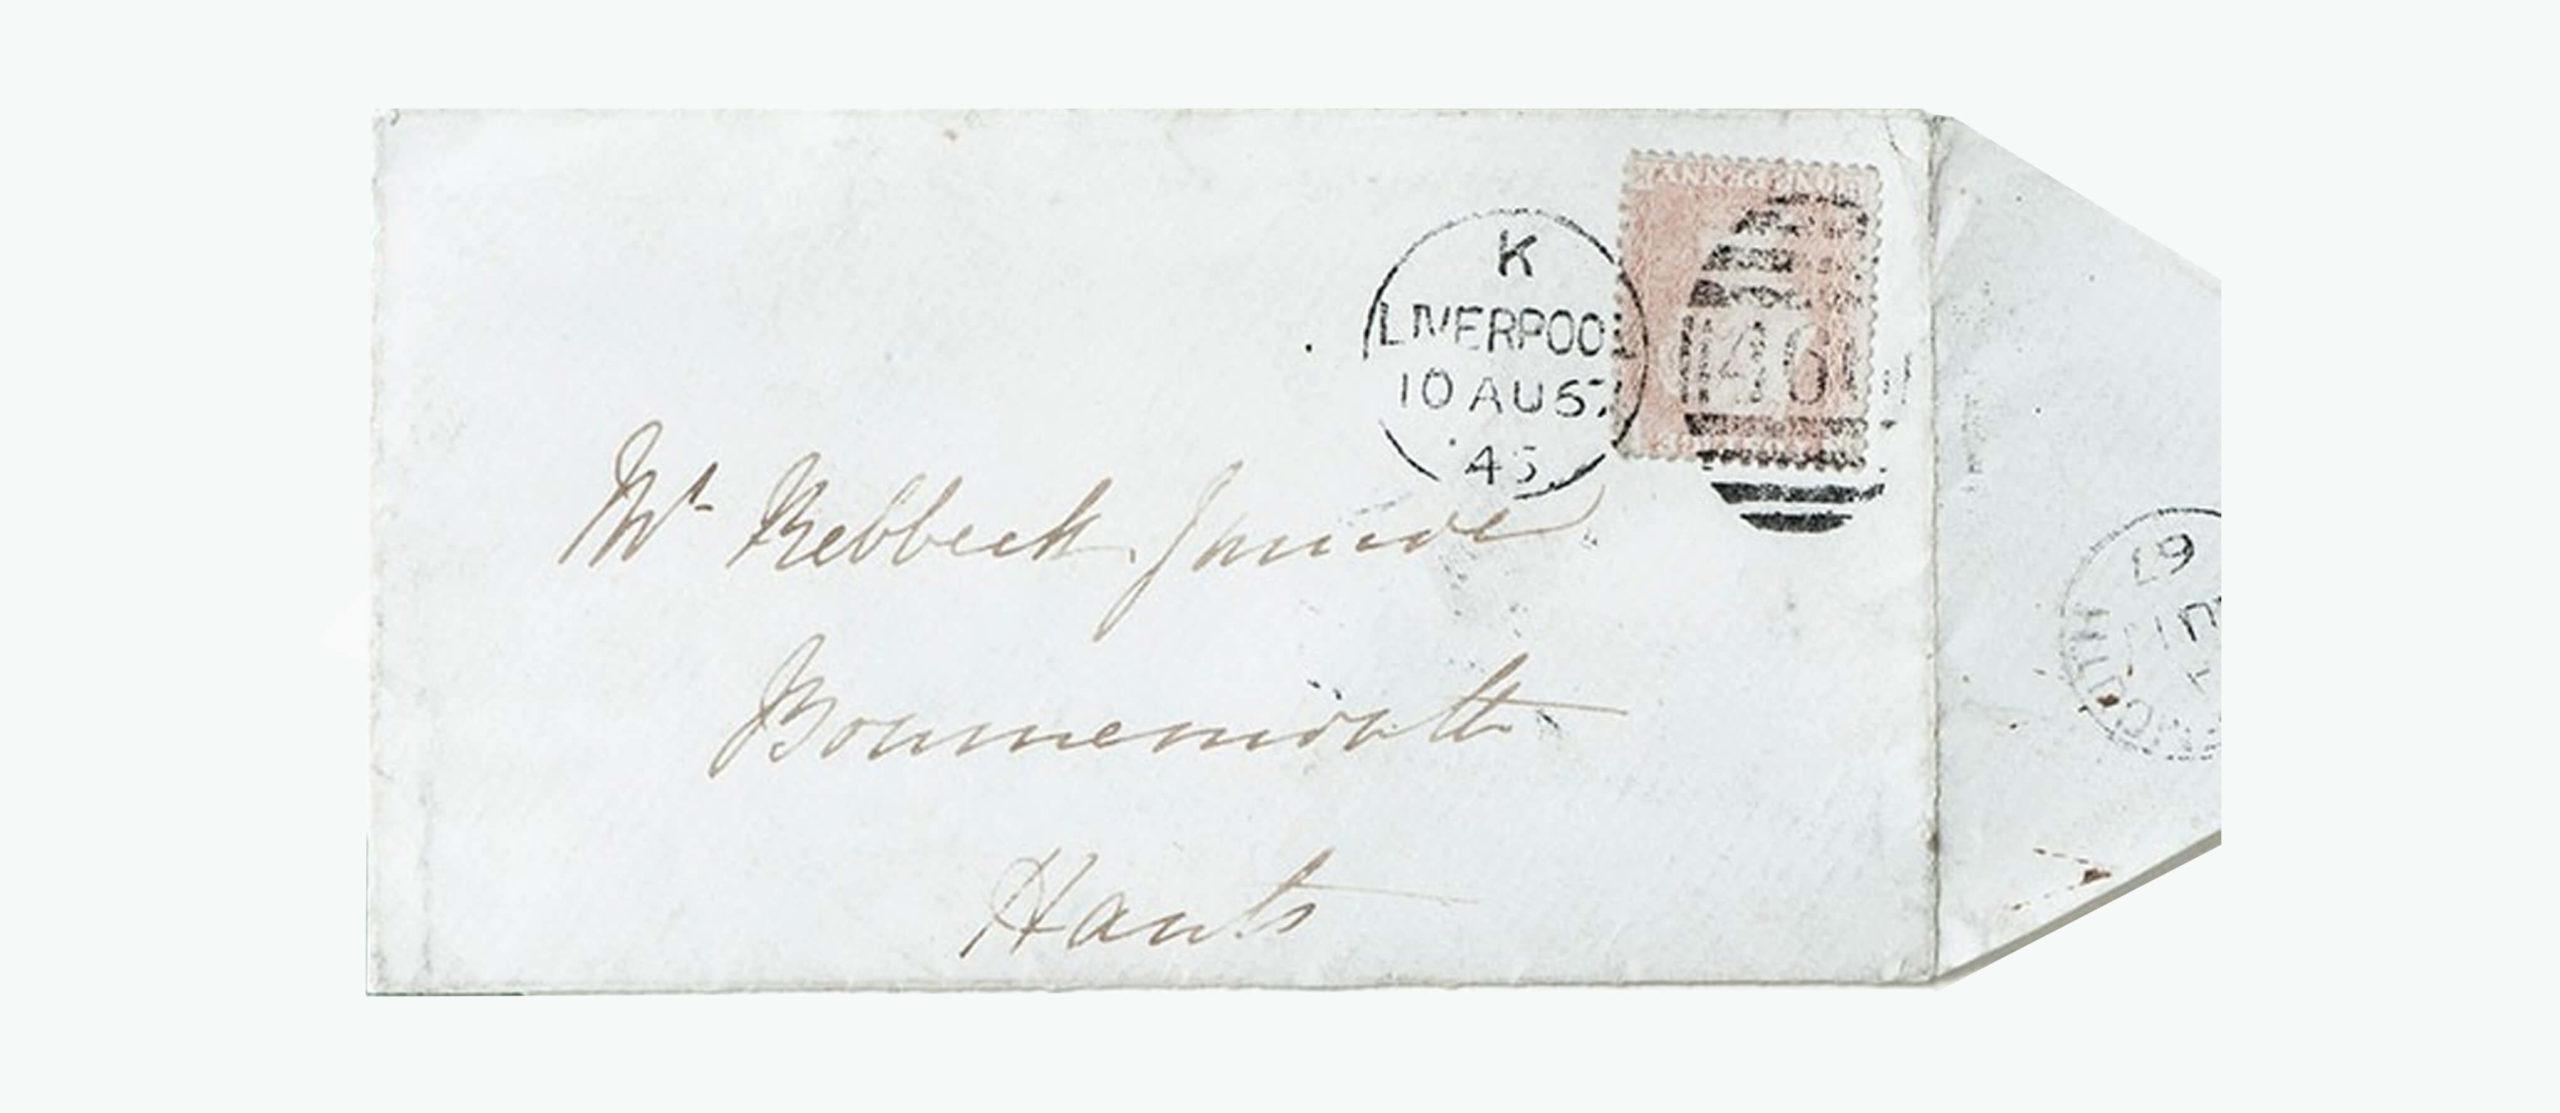 Rebbeck Brothers Historical Letter